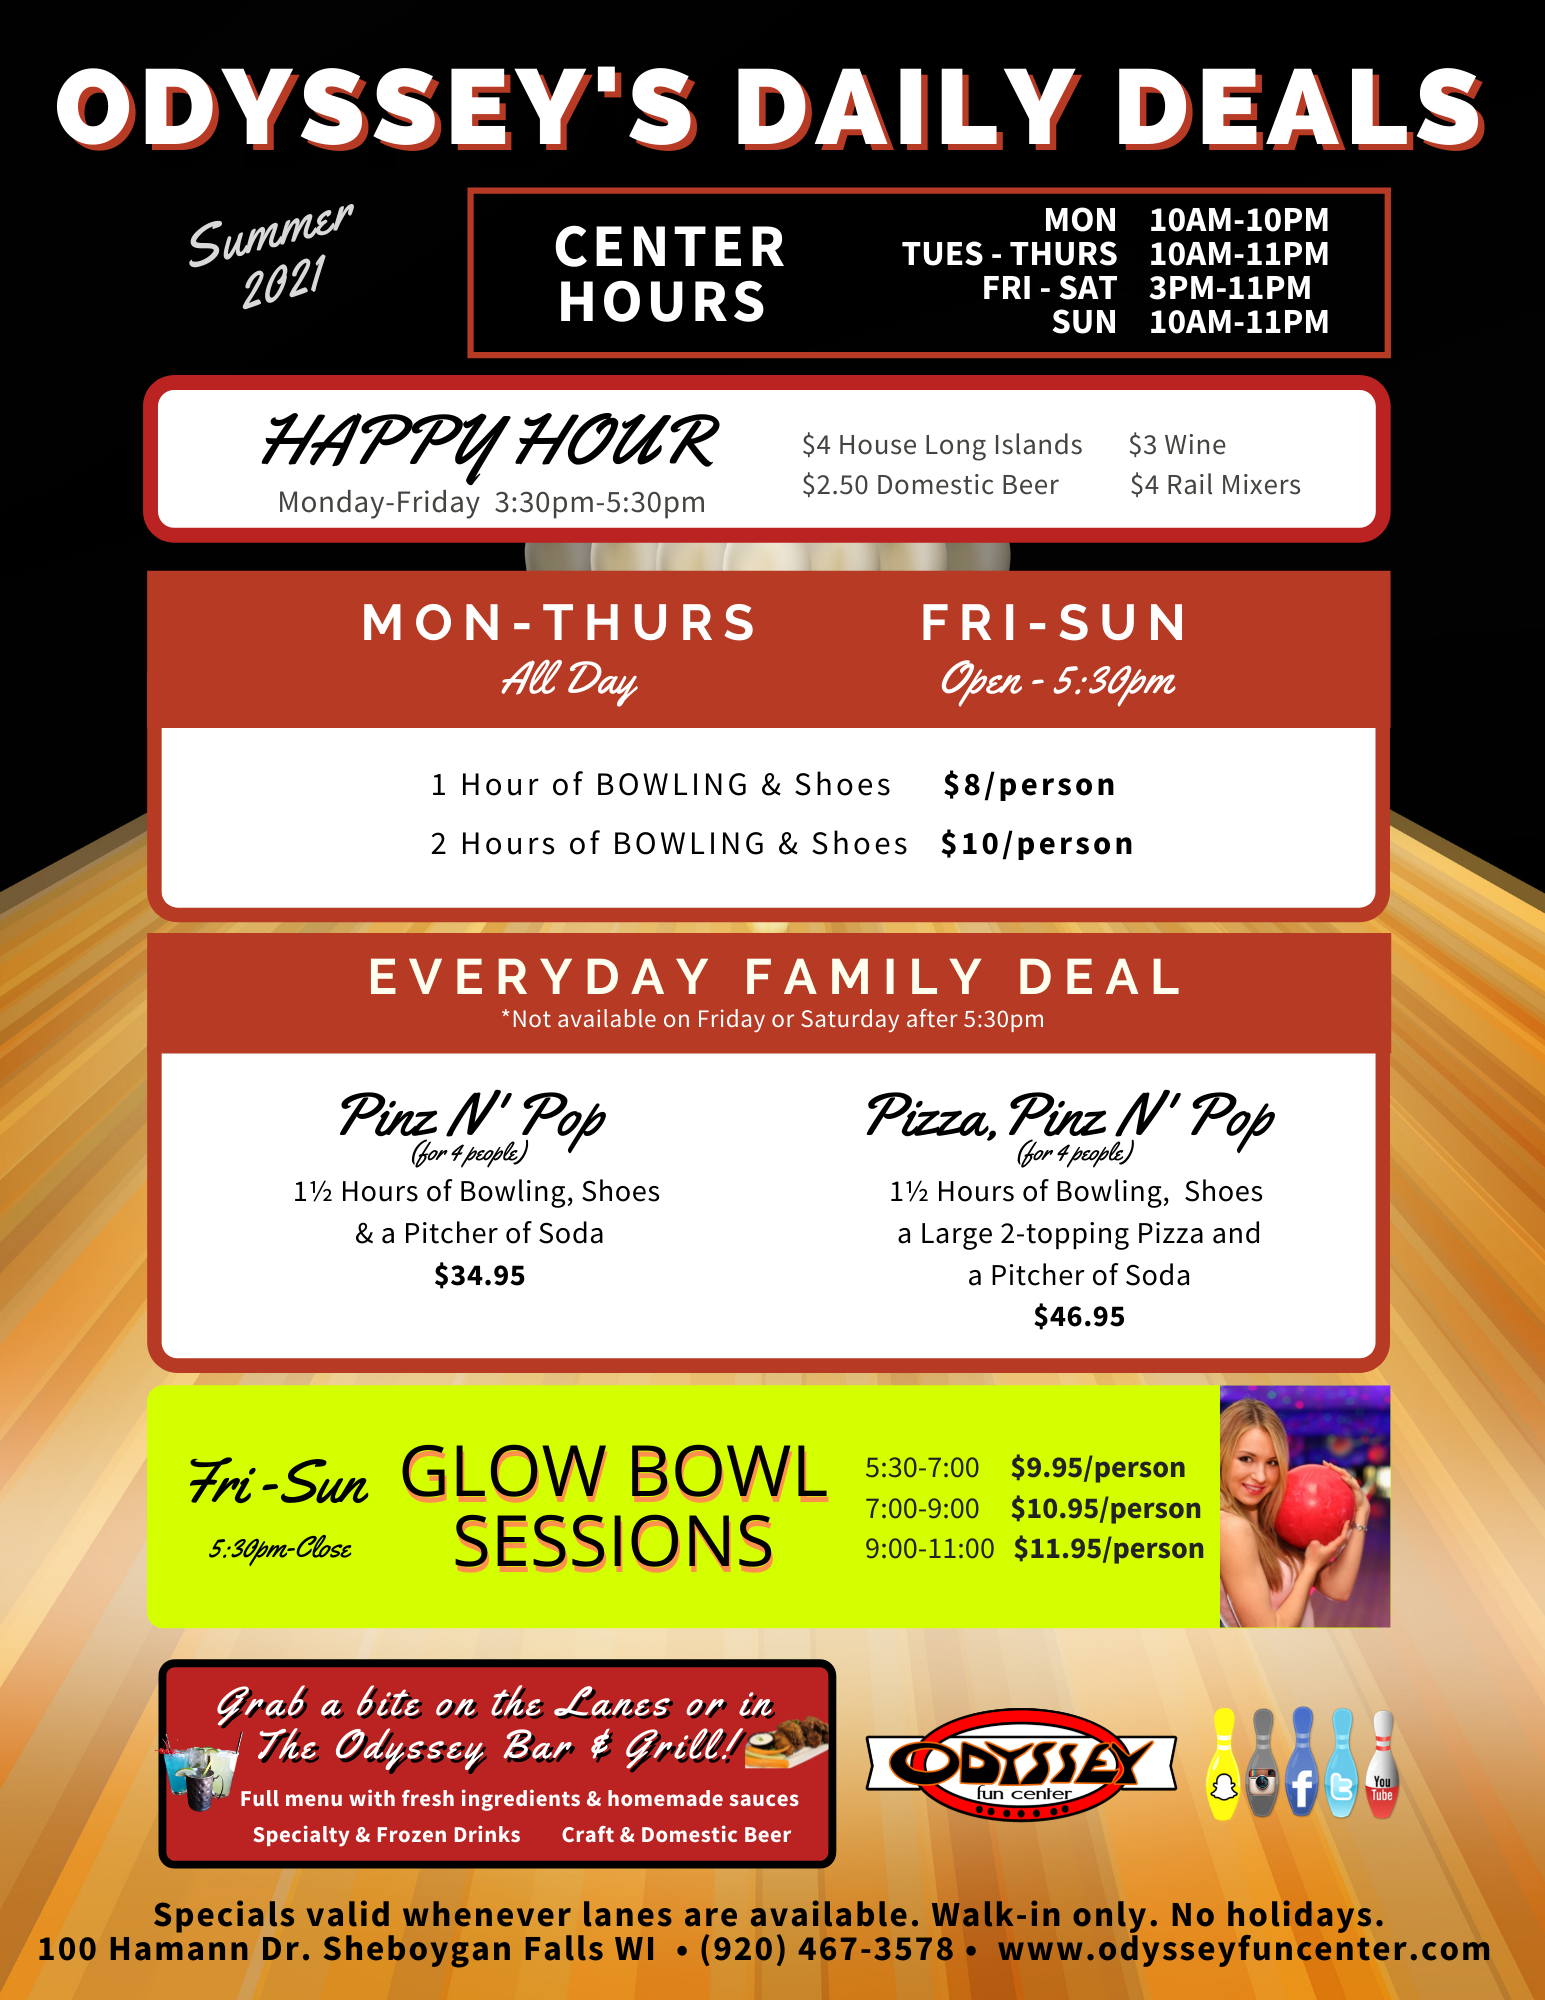 summer 2021 daily deals   bowling promotions   daily bowling savings   odyssey fun center   sheboygan falls, wi